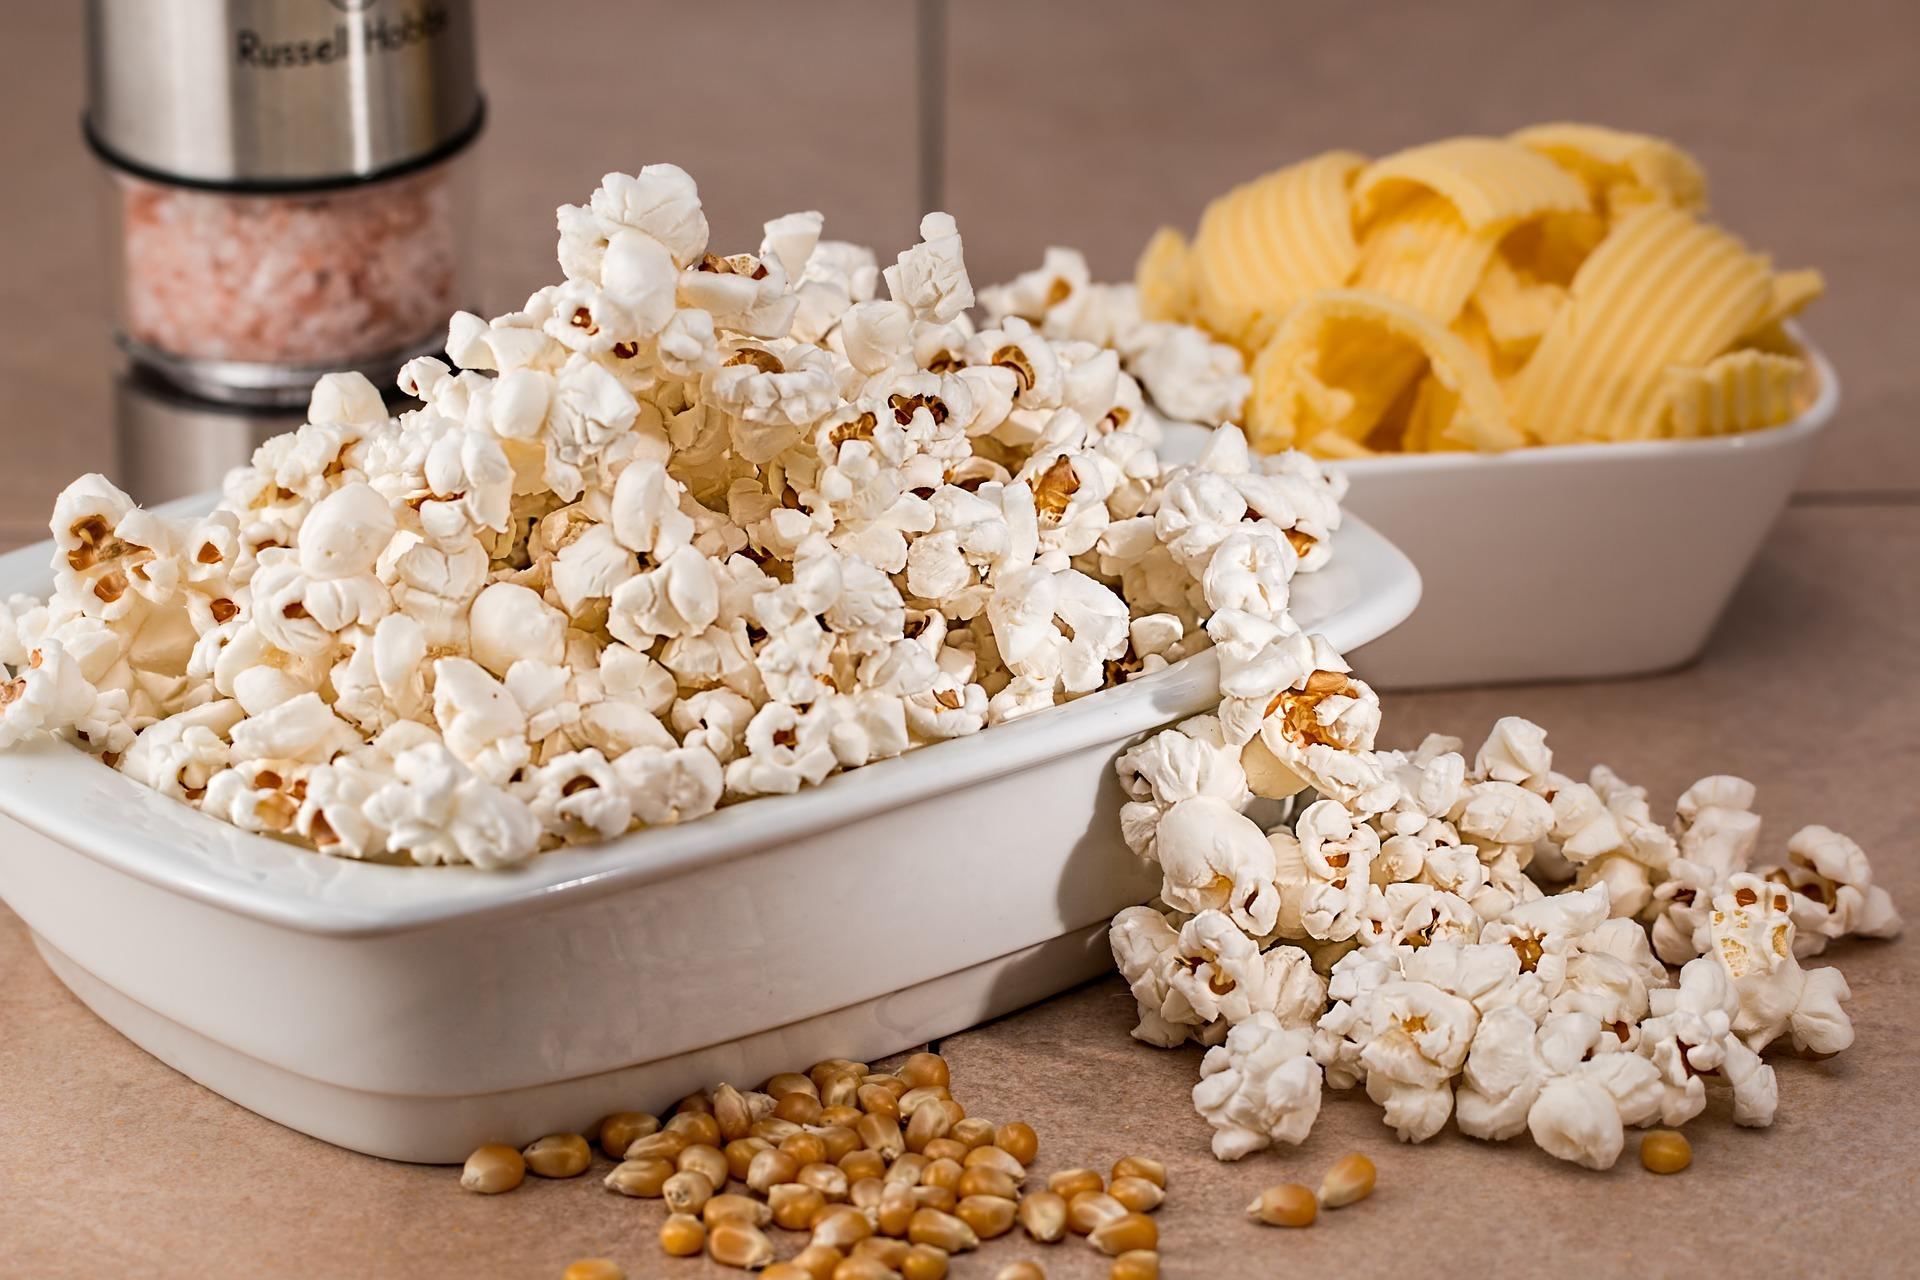 Popcorn crisps